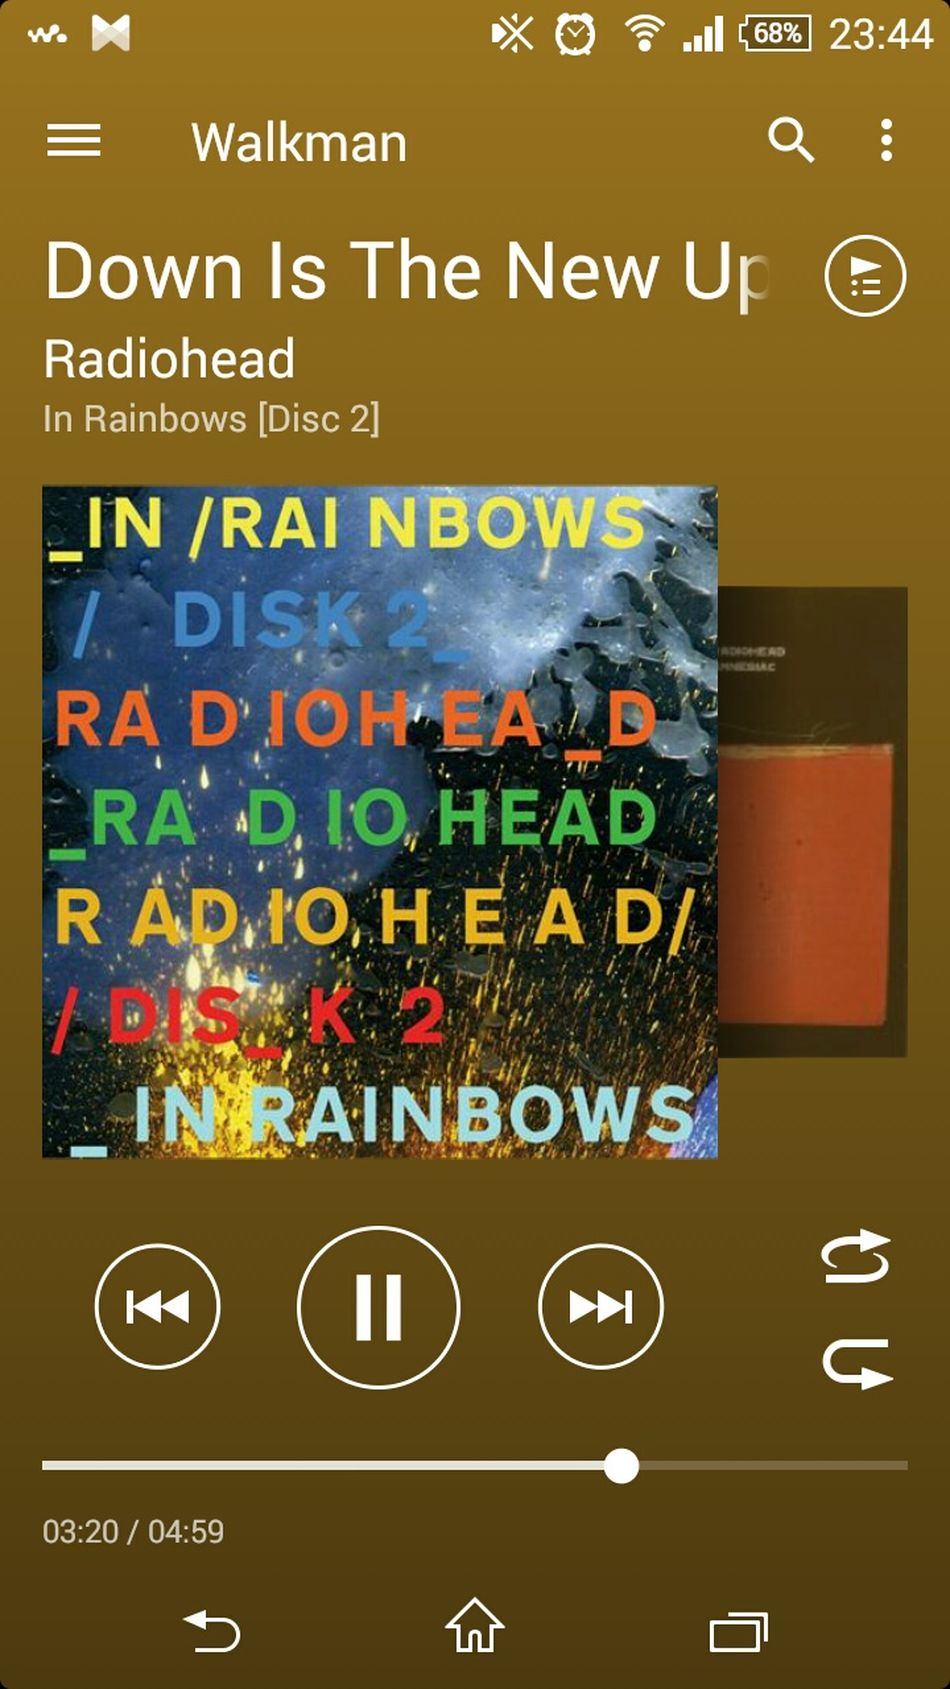 Music Sleepless Radiohead Good Music Down Is The New Up